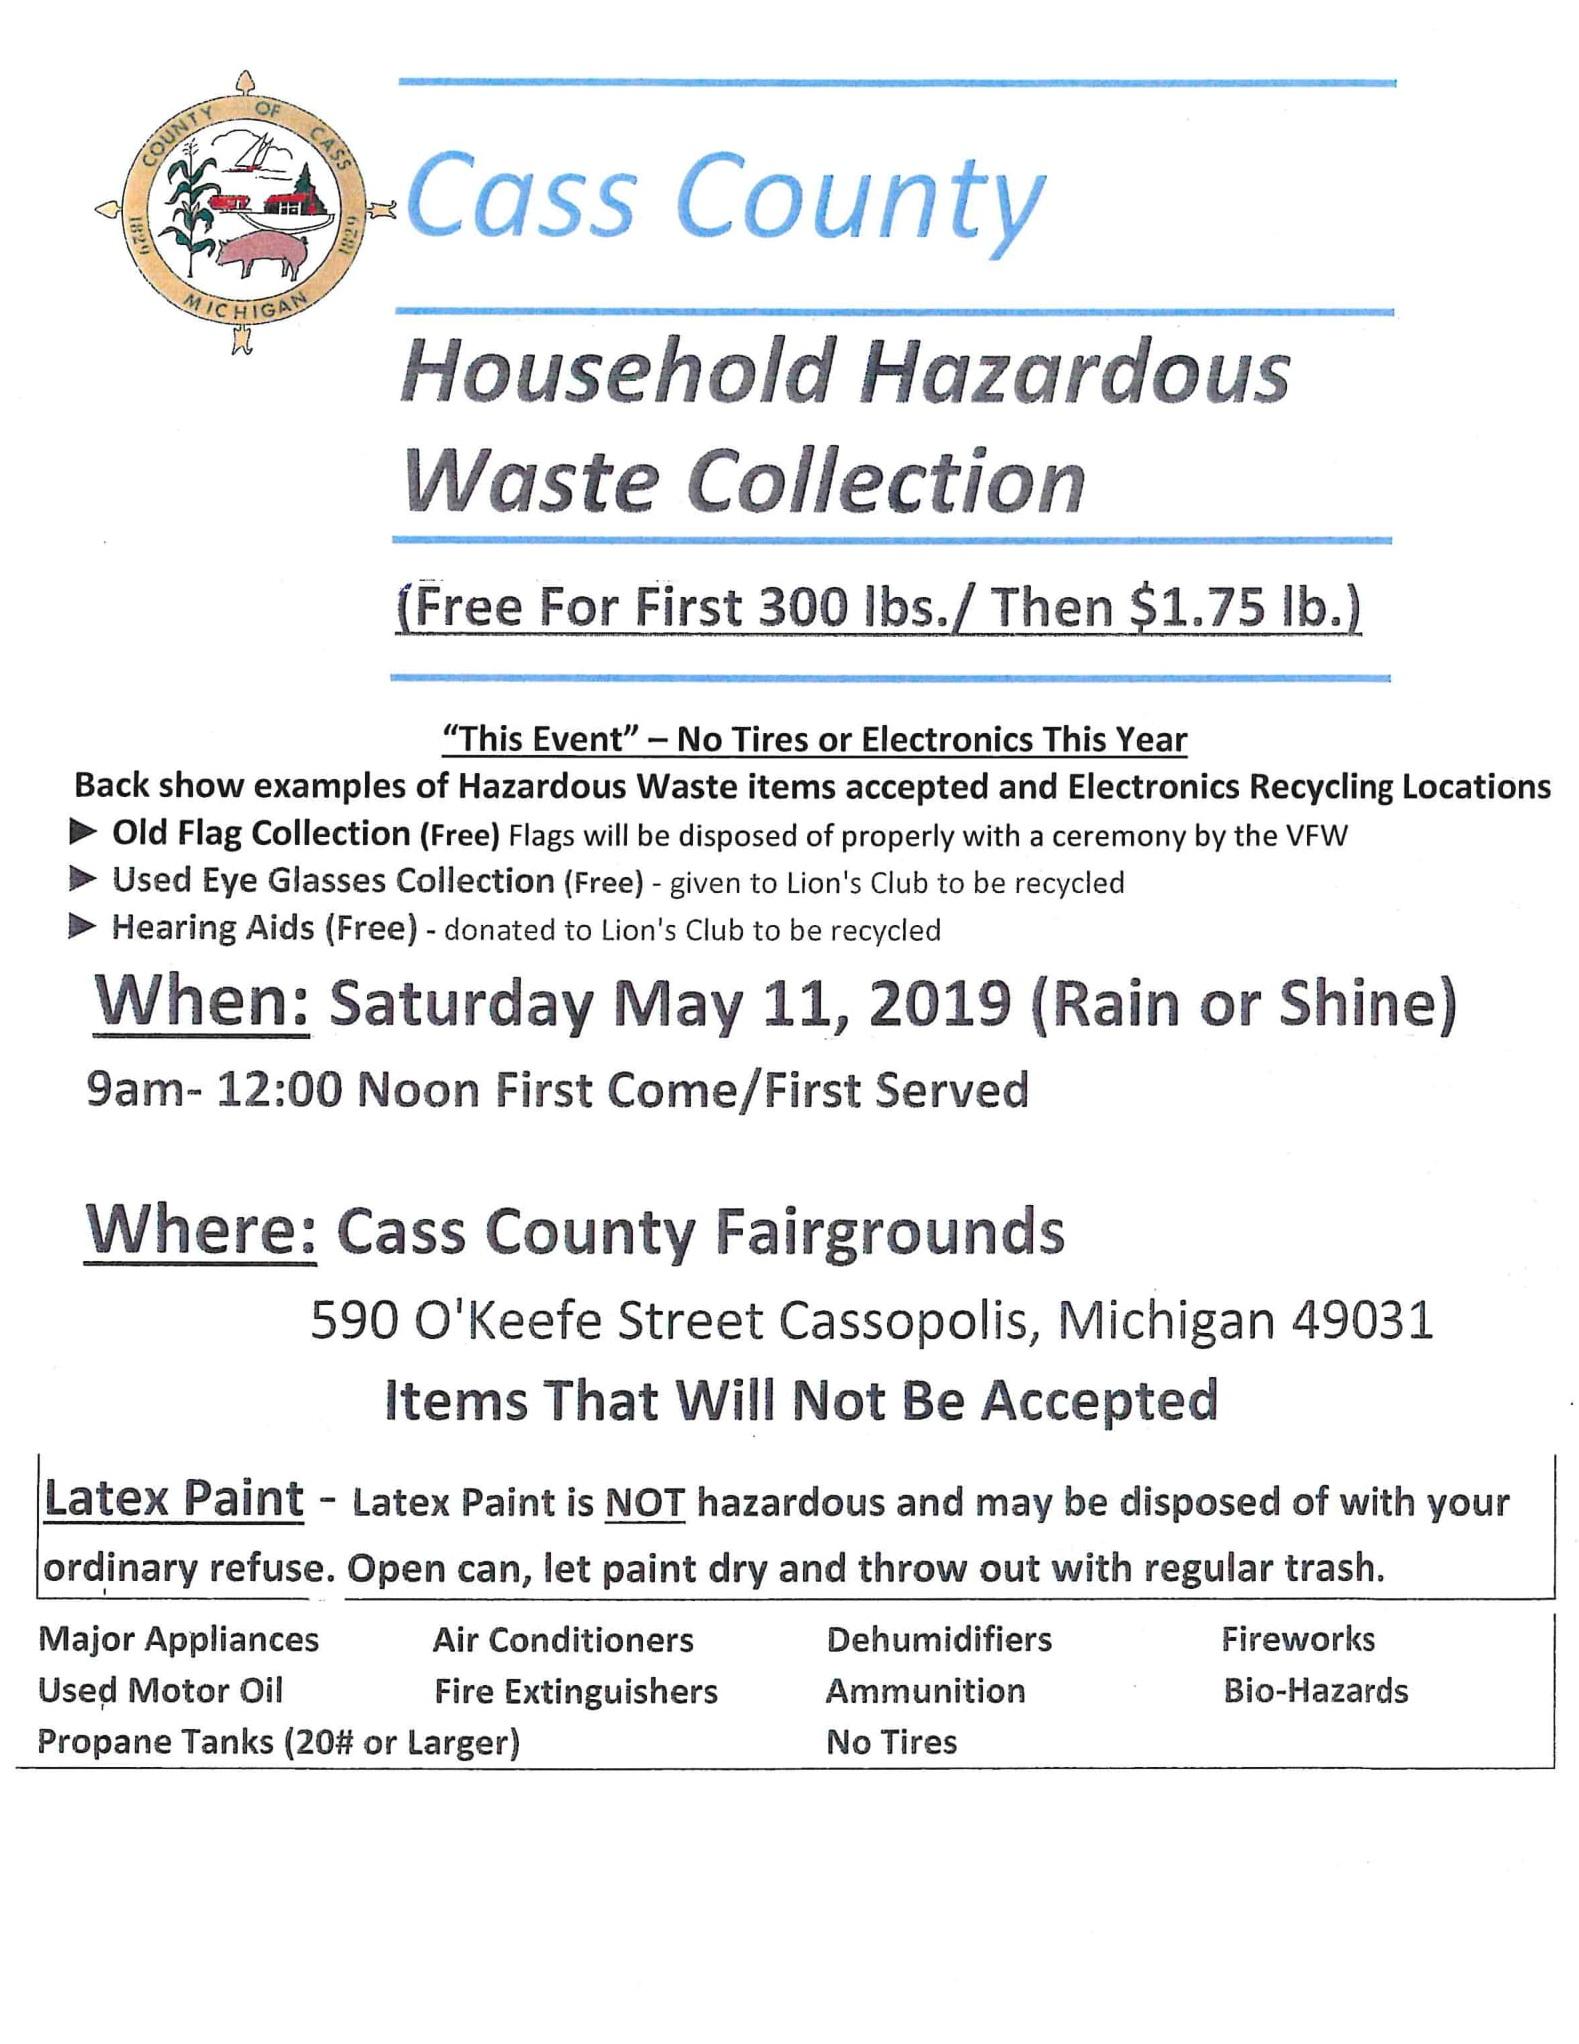 Cass County Houshold Hazardous Waste Collection — Village of Edwardsburg